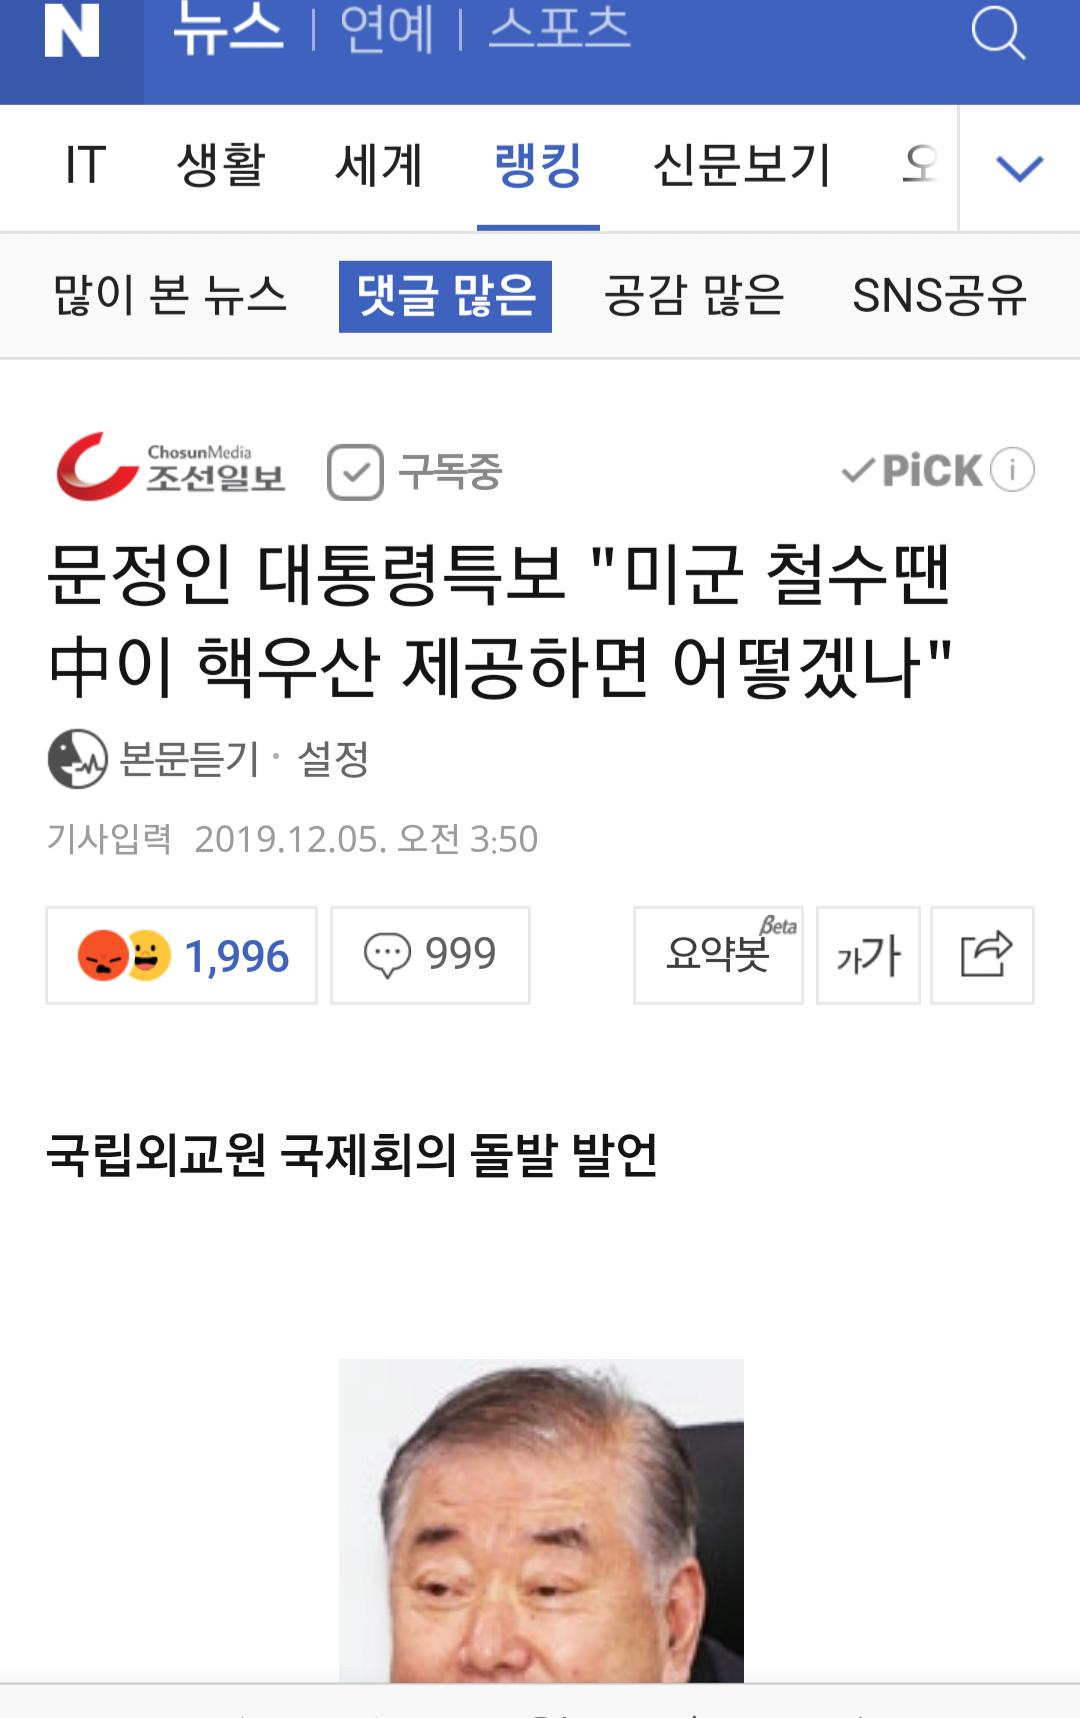 20191205_112018.png 대통령 안보 최측근 발언.news